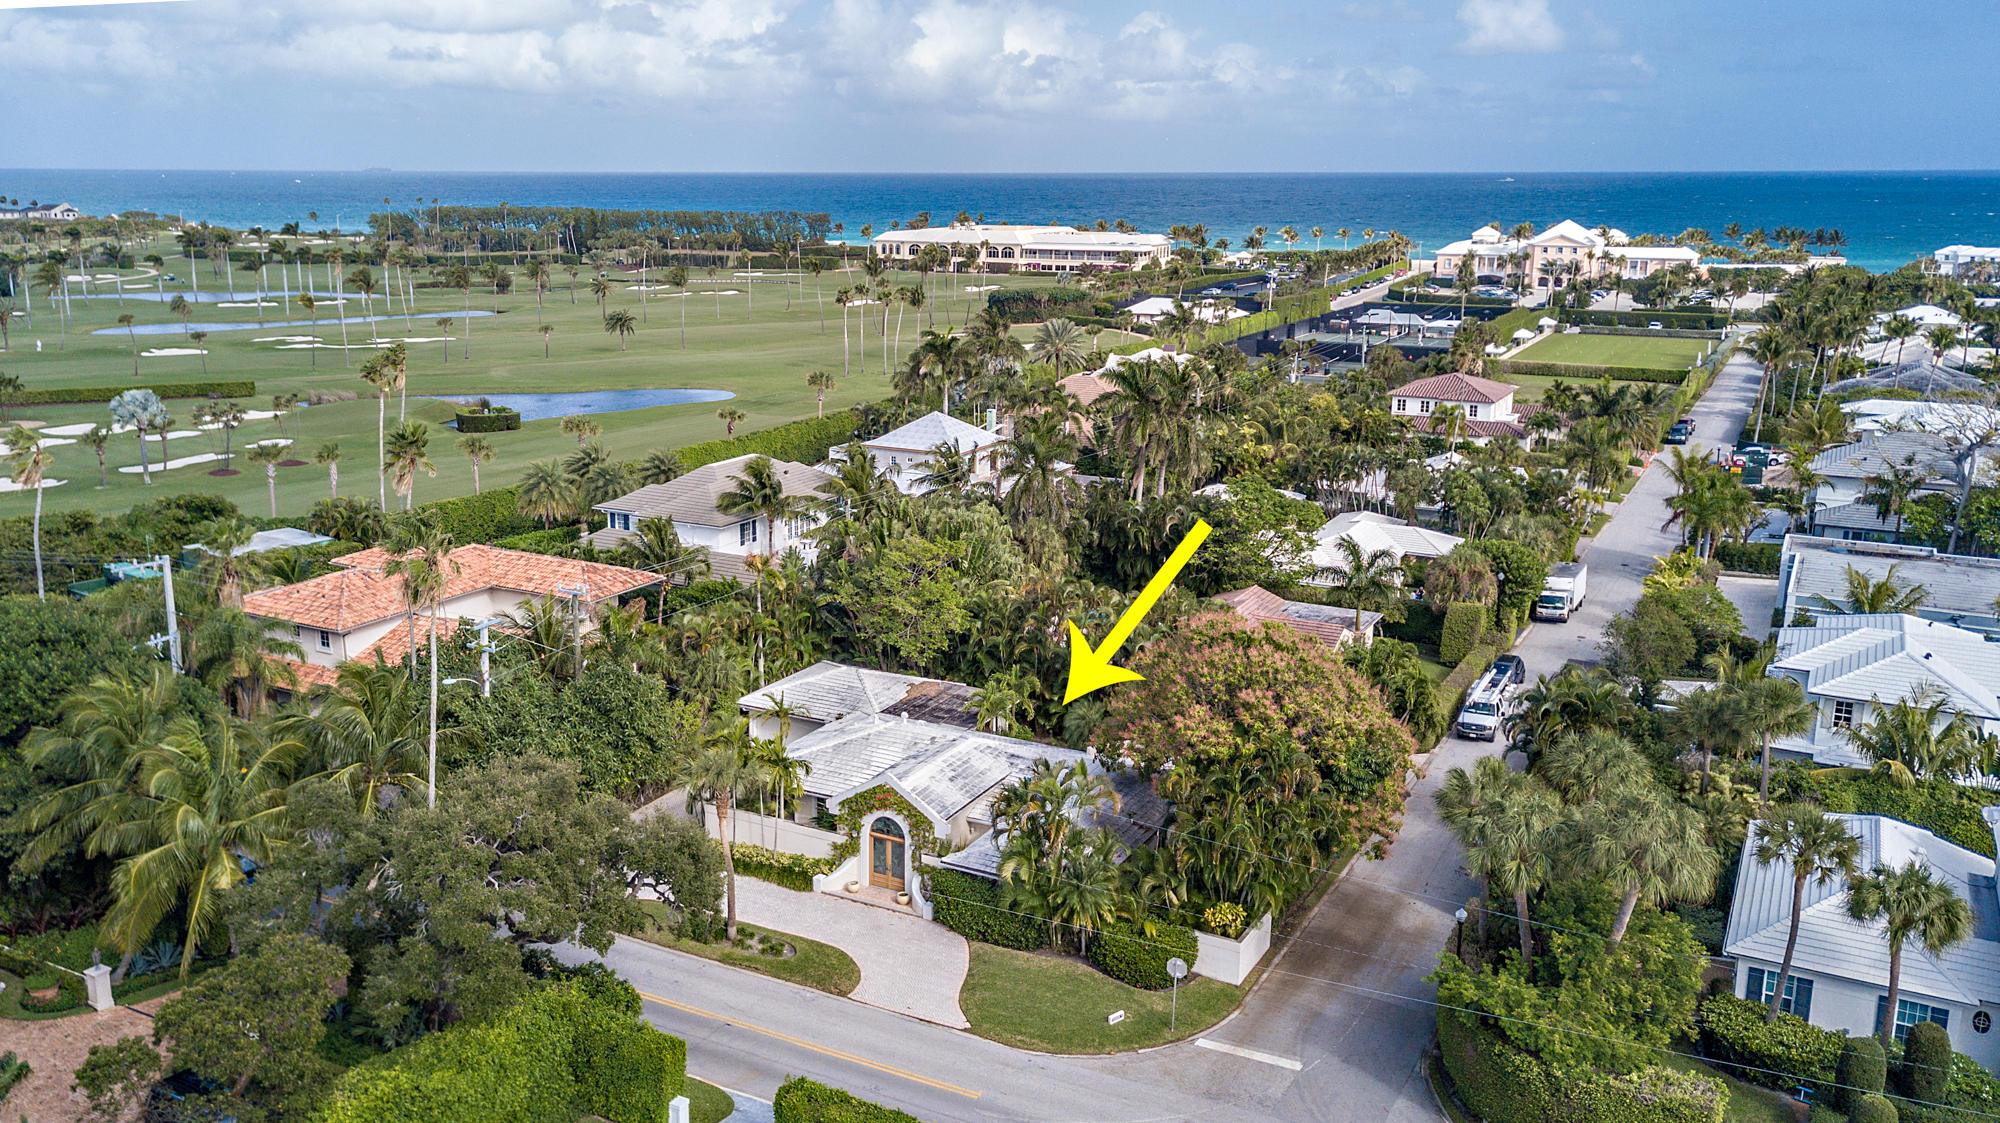 755 N Lake Way - Palm Beach, Florida